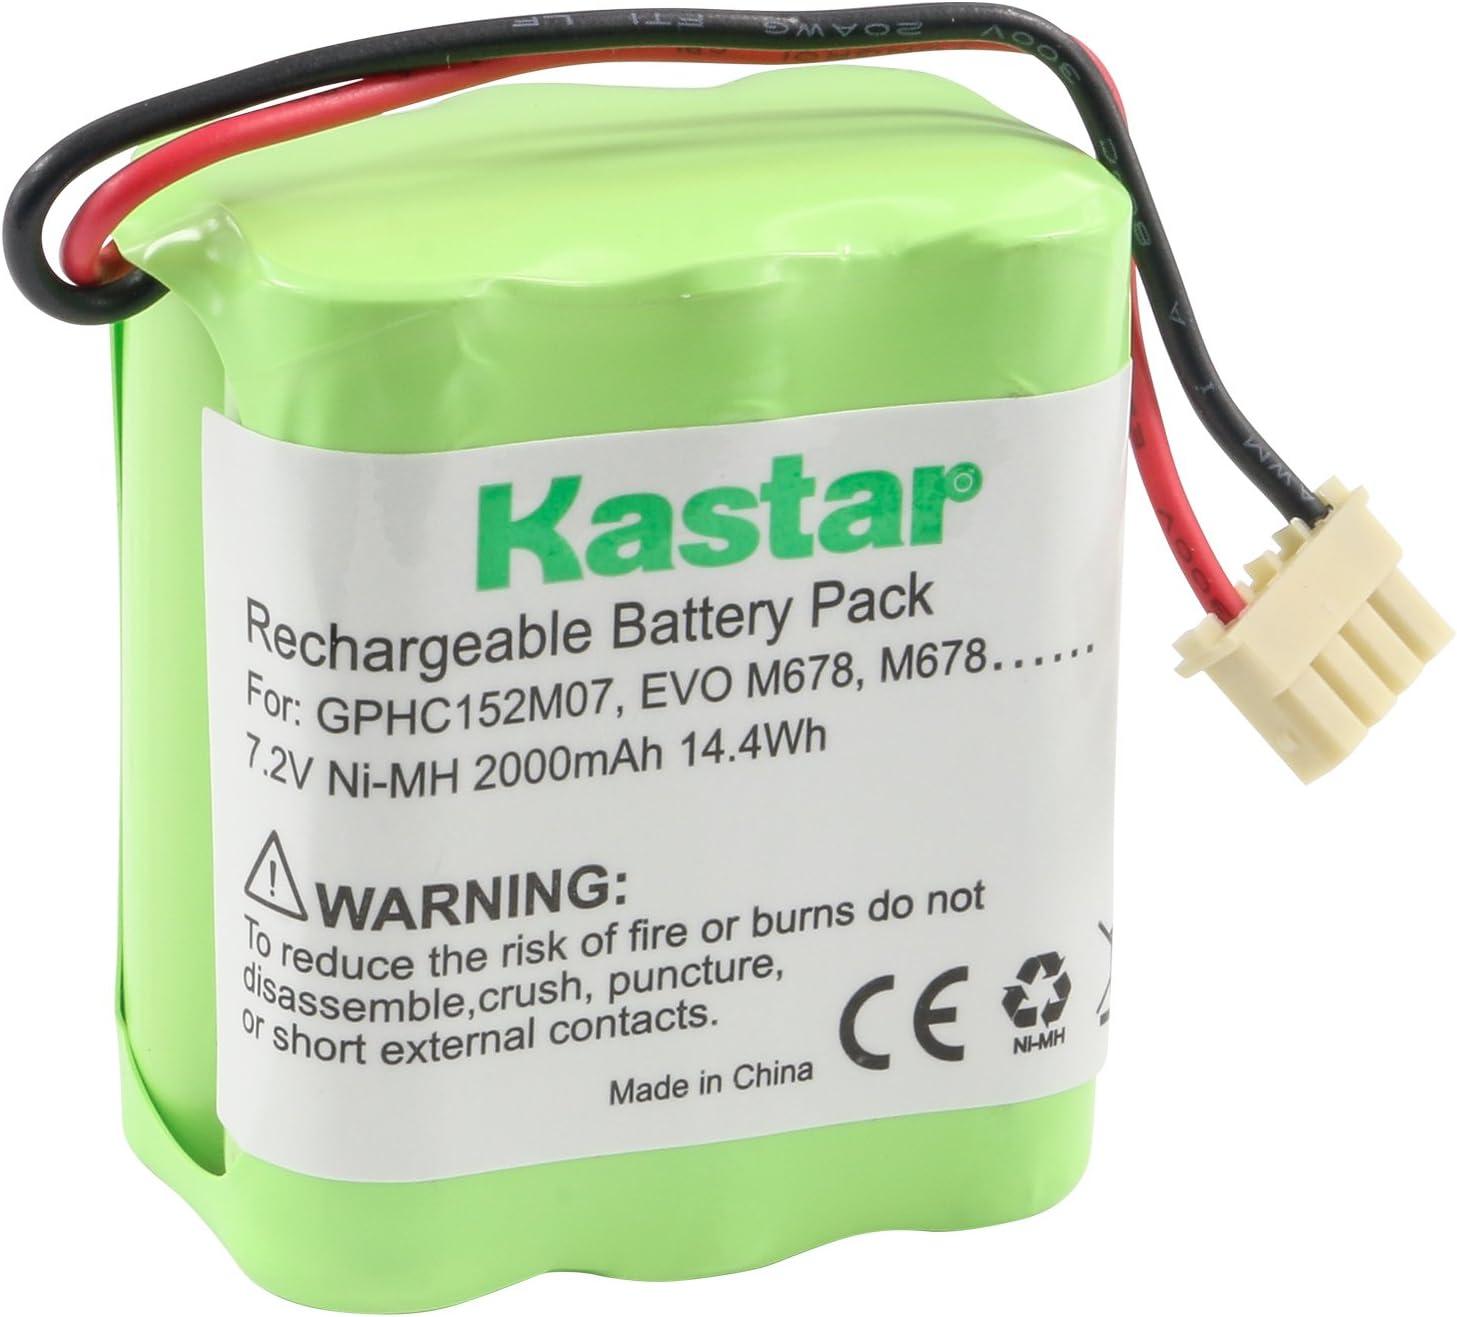 Kastar GPHC152M07 Battery (1 Pack), Ni-MH 7.2V 2000mAh, Replacement for Dirt-Devil GPHC152M07, Mint 4200, M678, EVO M678